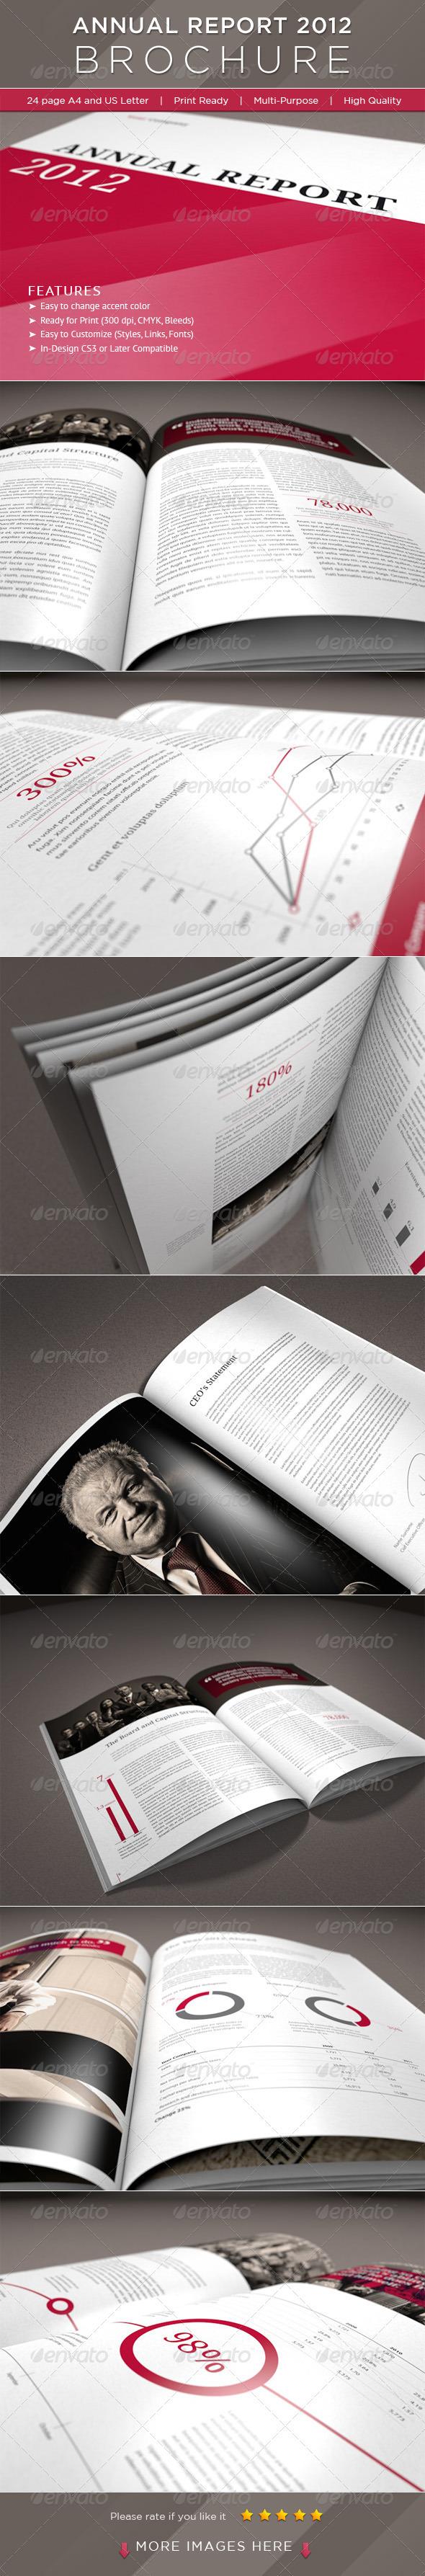 GraphicRiver 24 Page Annual Report Brochure 883492